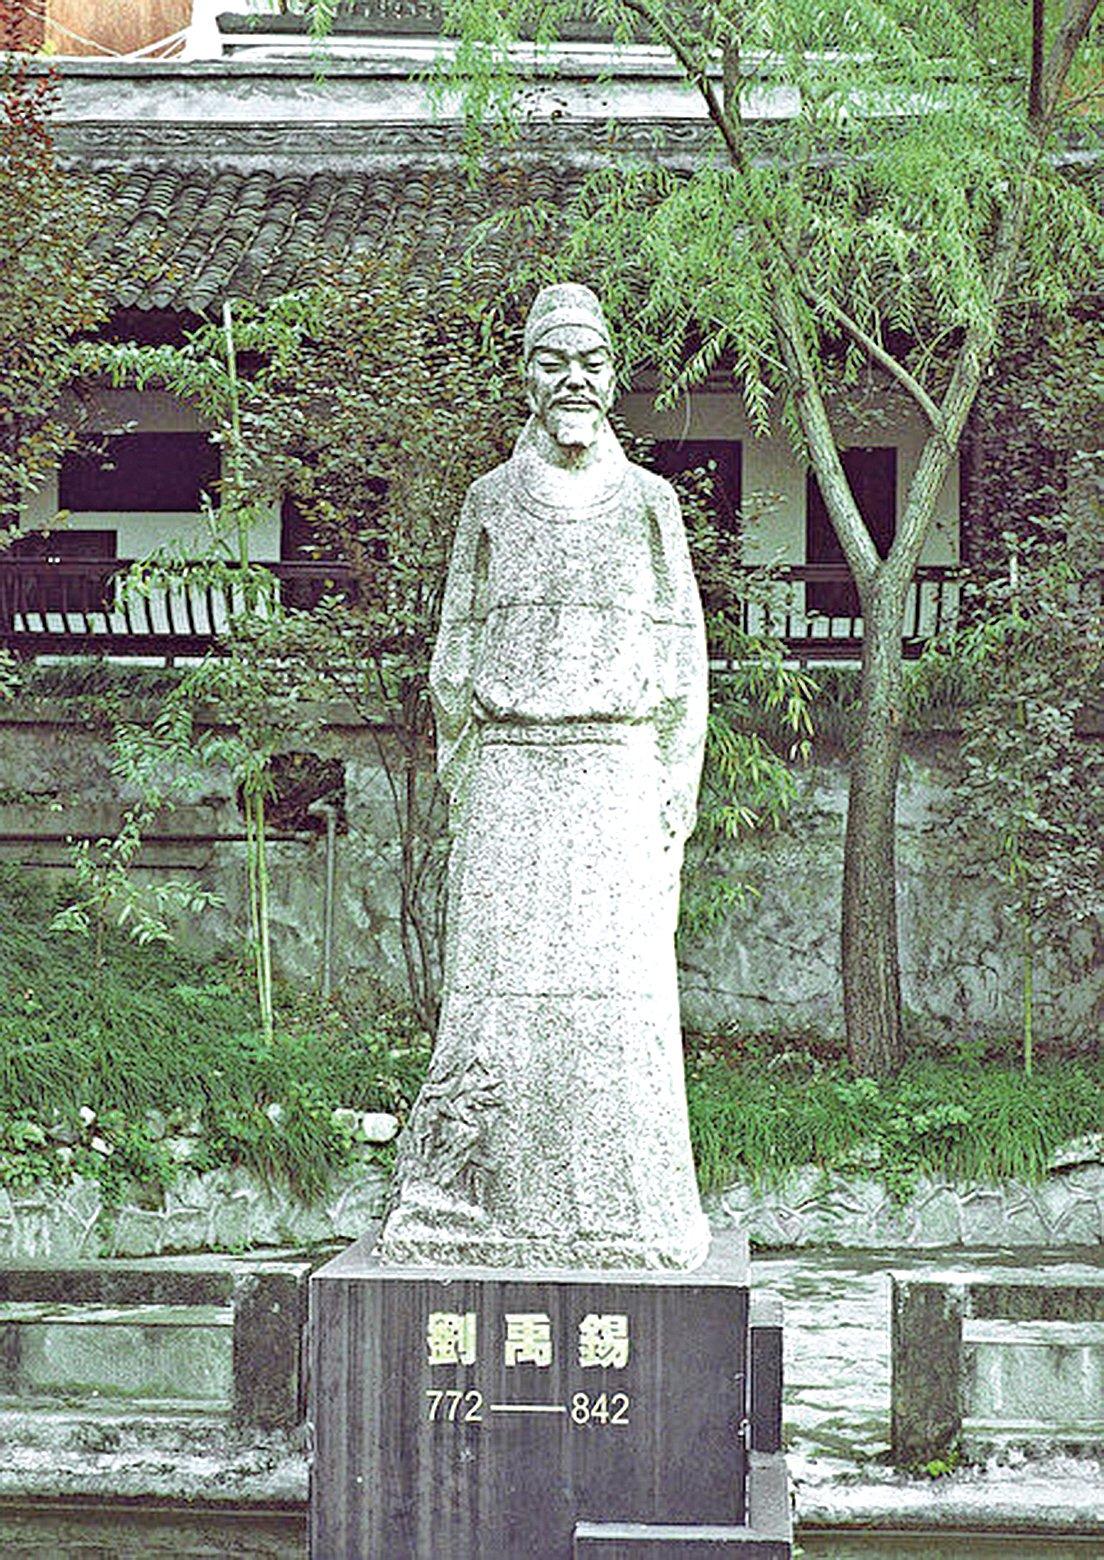 劉禹錫像(Gisling/Wikimedia Commons)